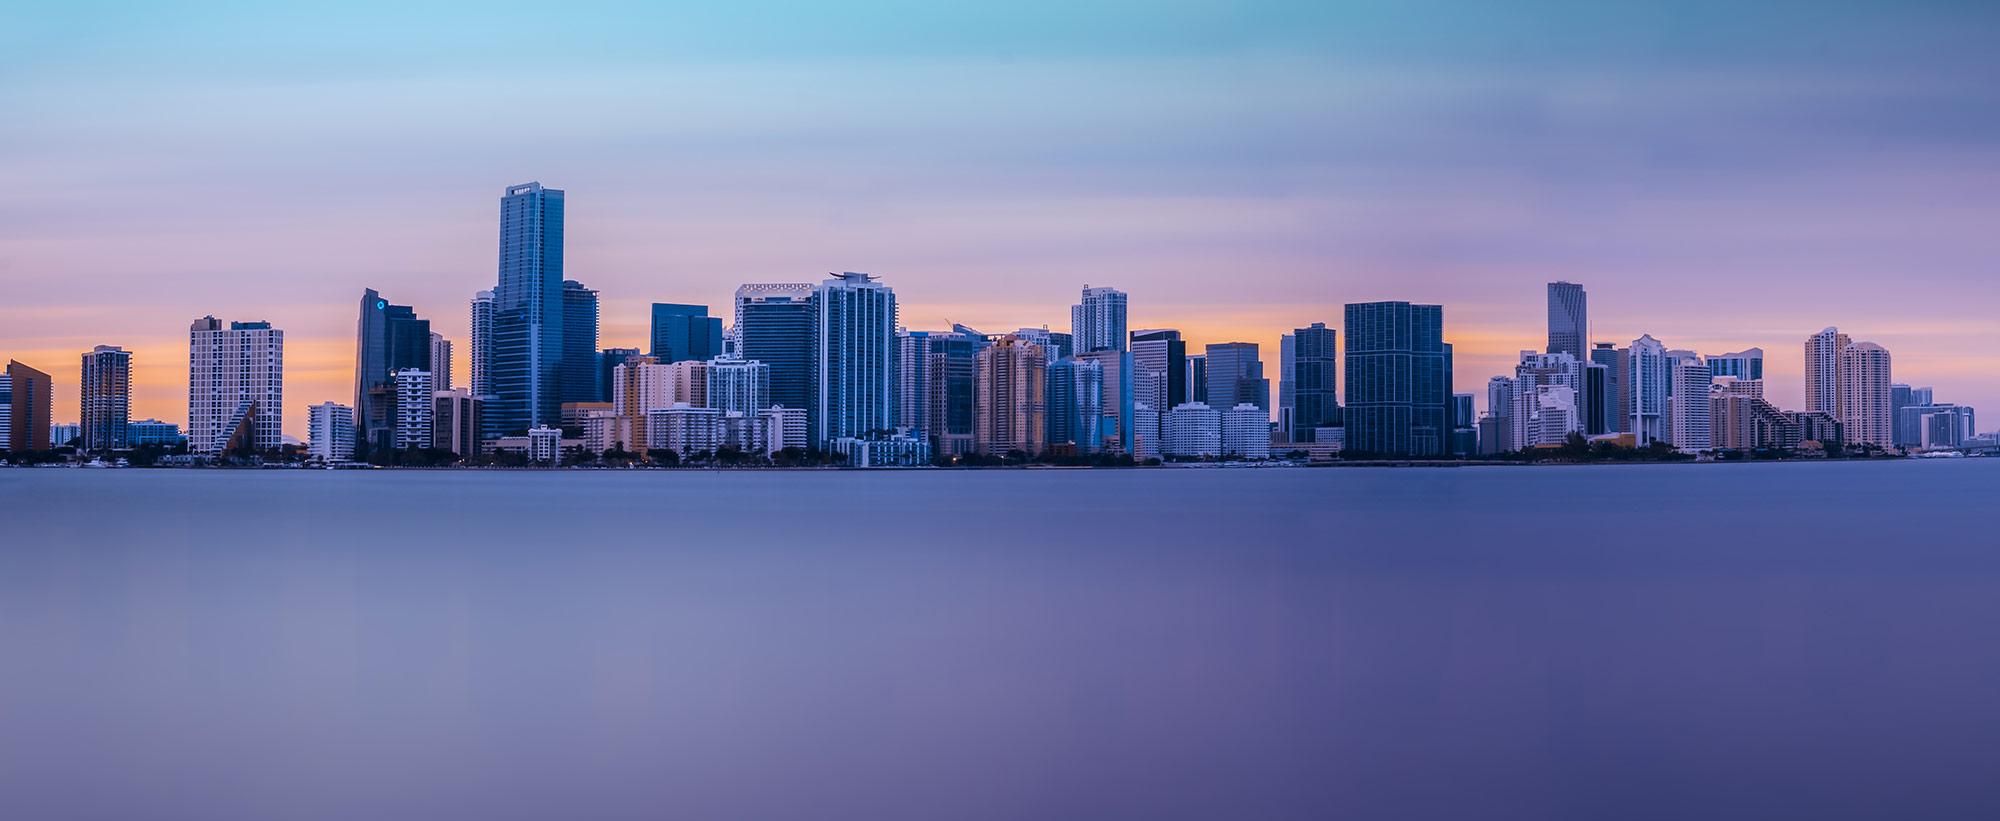 A cityscape photograph of the Miami Skyline